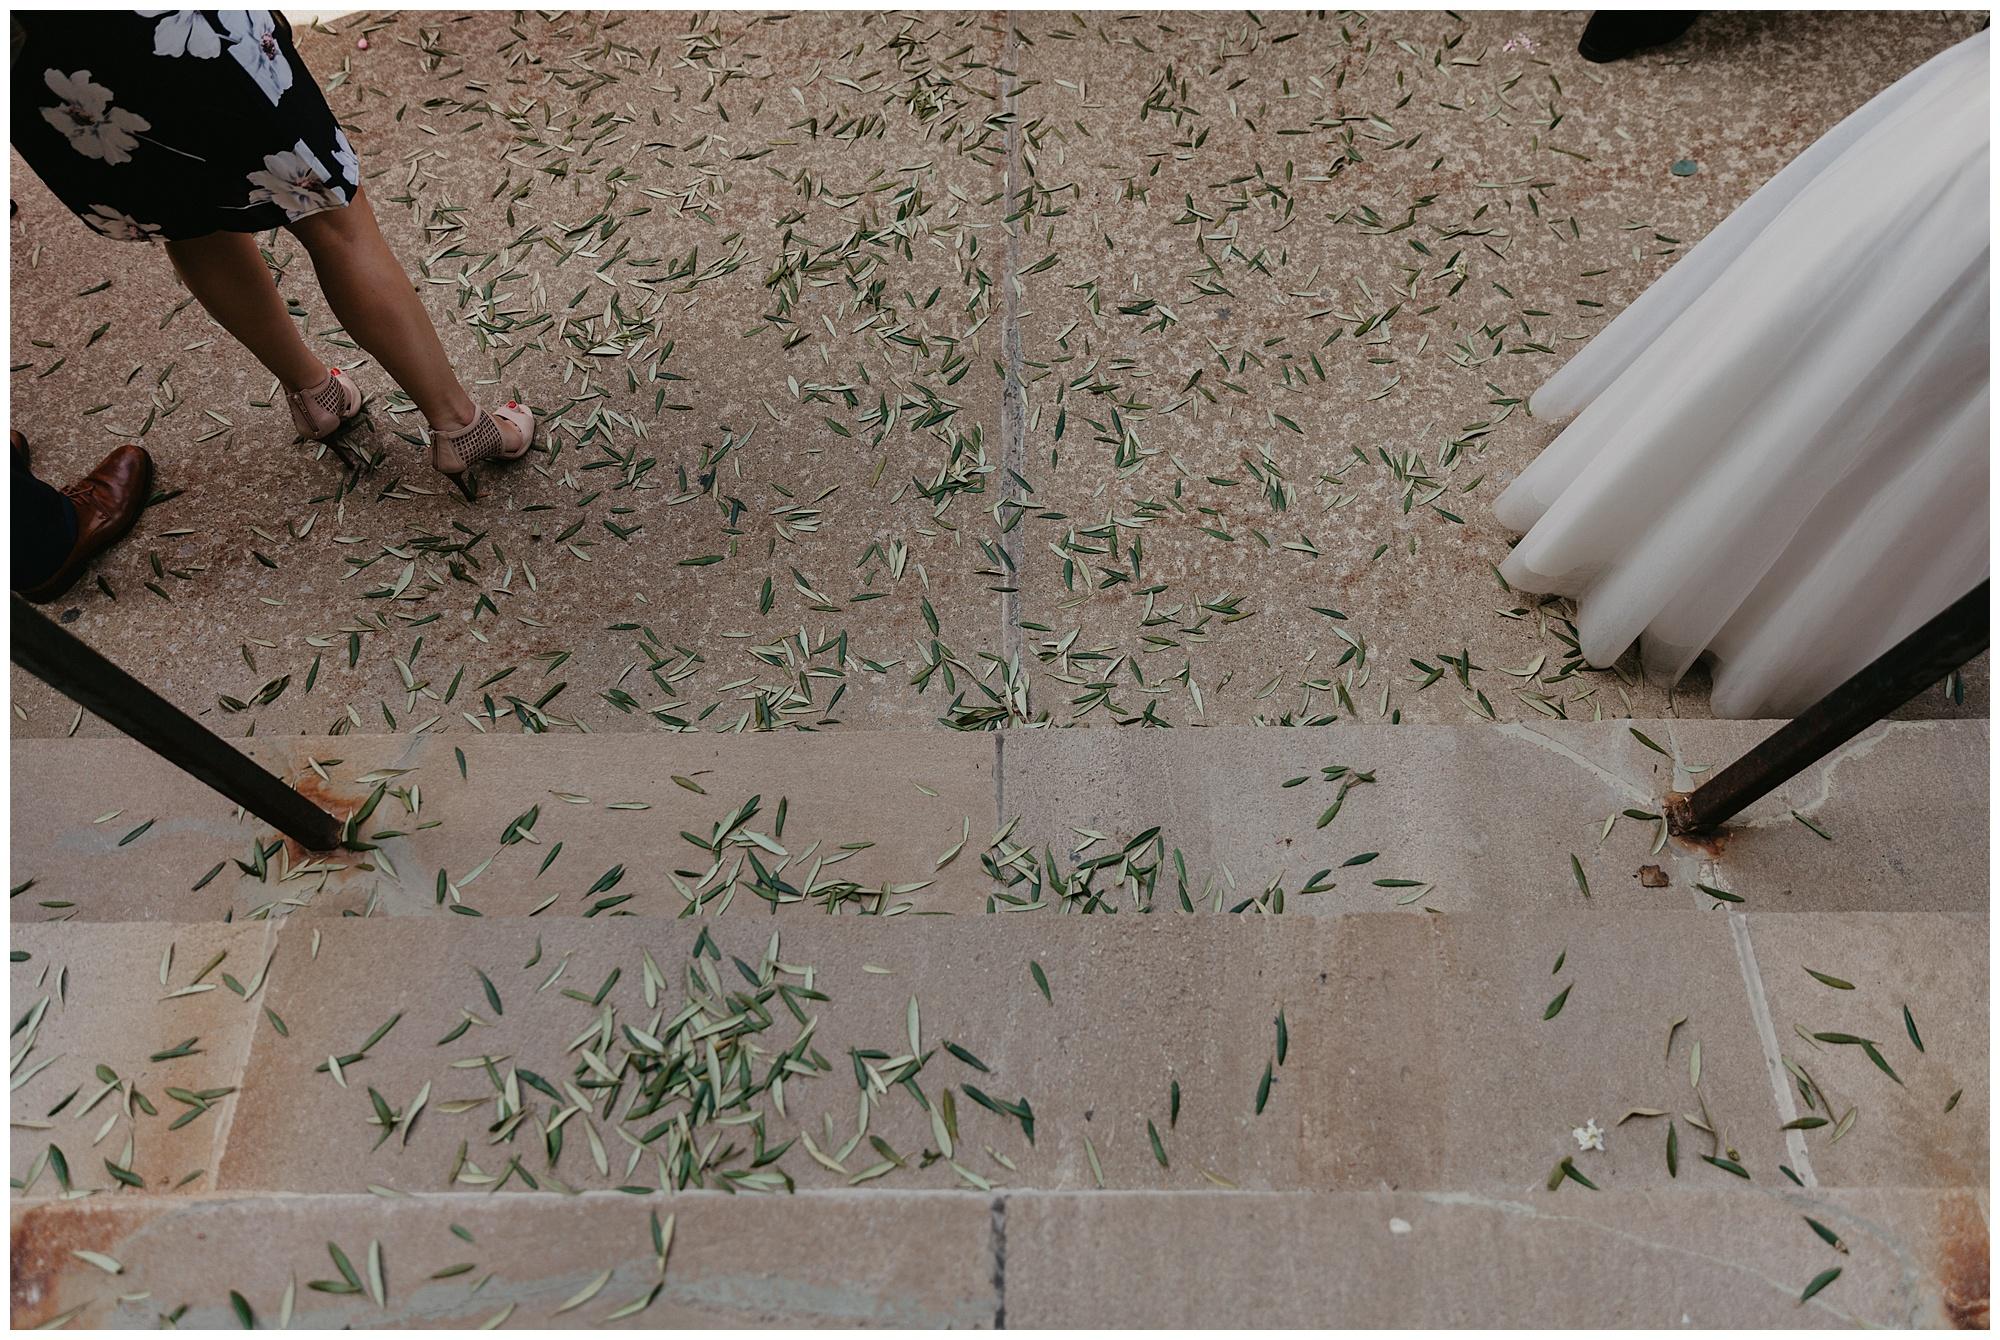 pear_tree_estate_wedding_champaign_il_wright_photographs_jj_0041.jpg